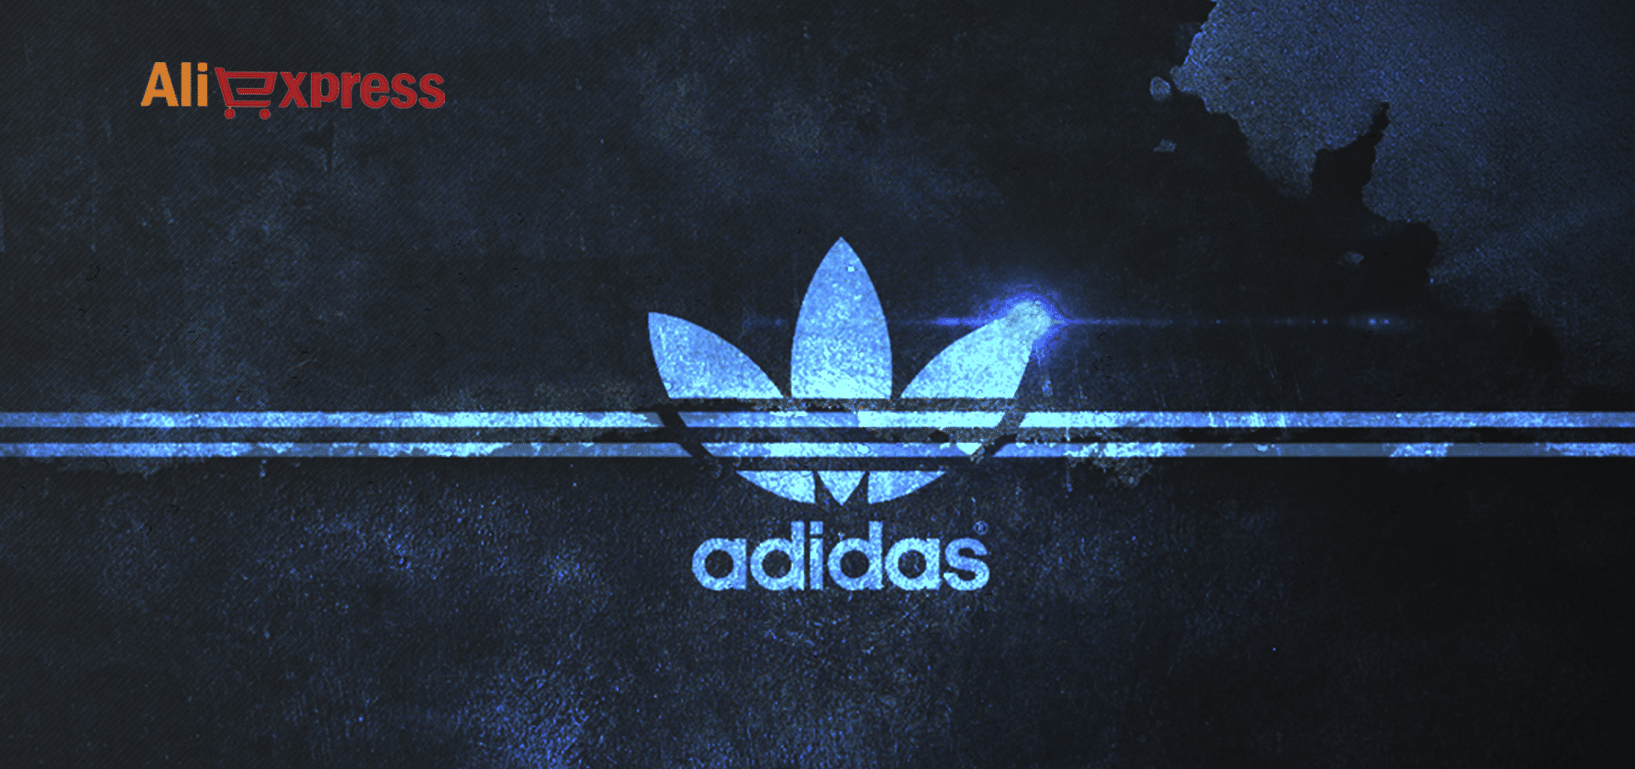 Adidas BON MARCHÉ sur AliExpress